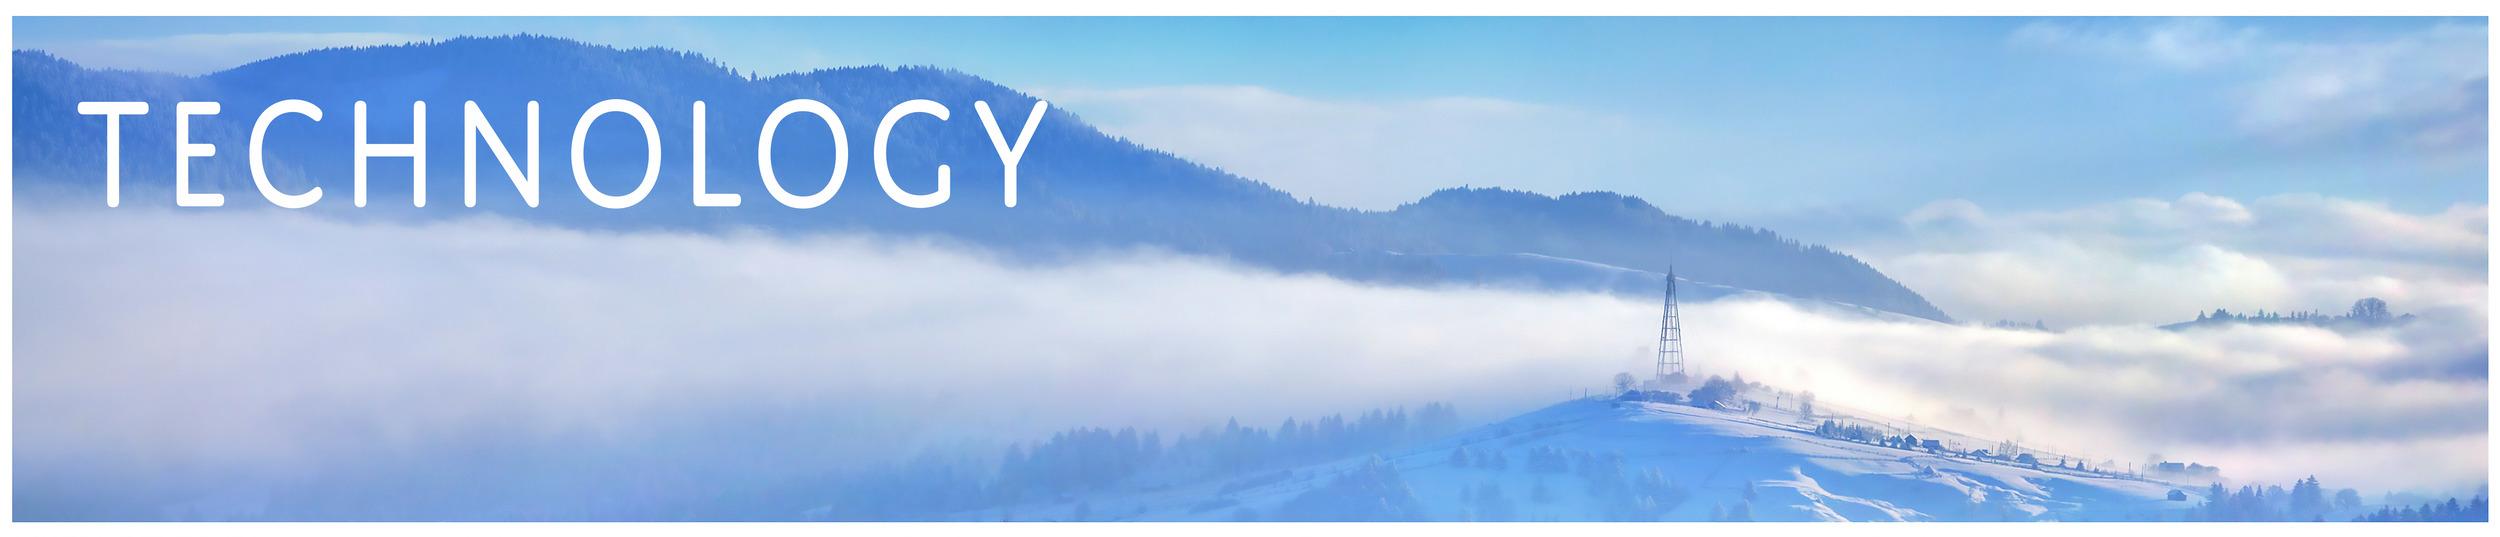 snow - technology.jpg